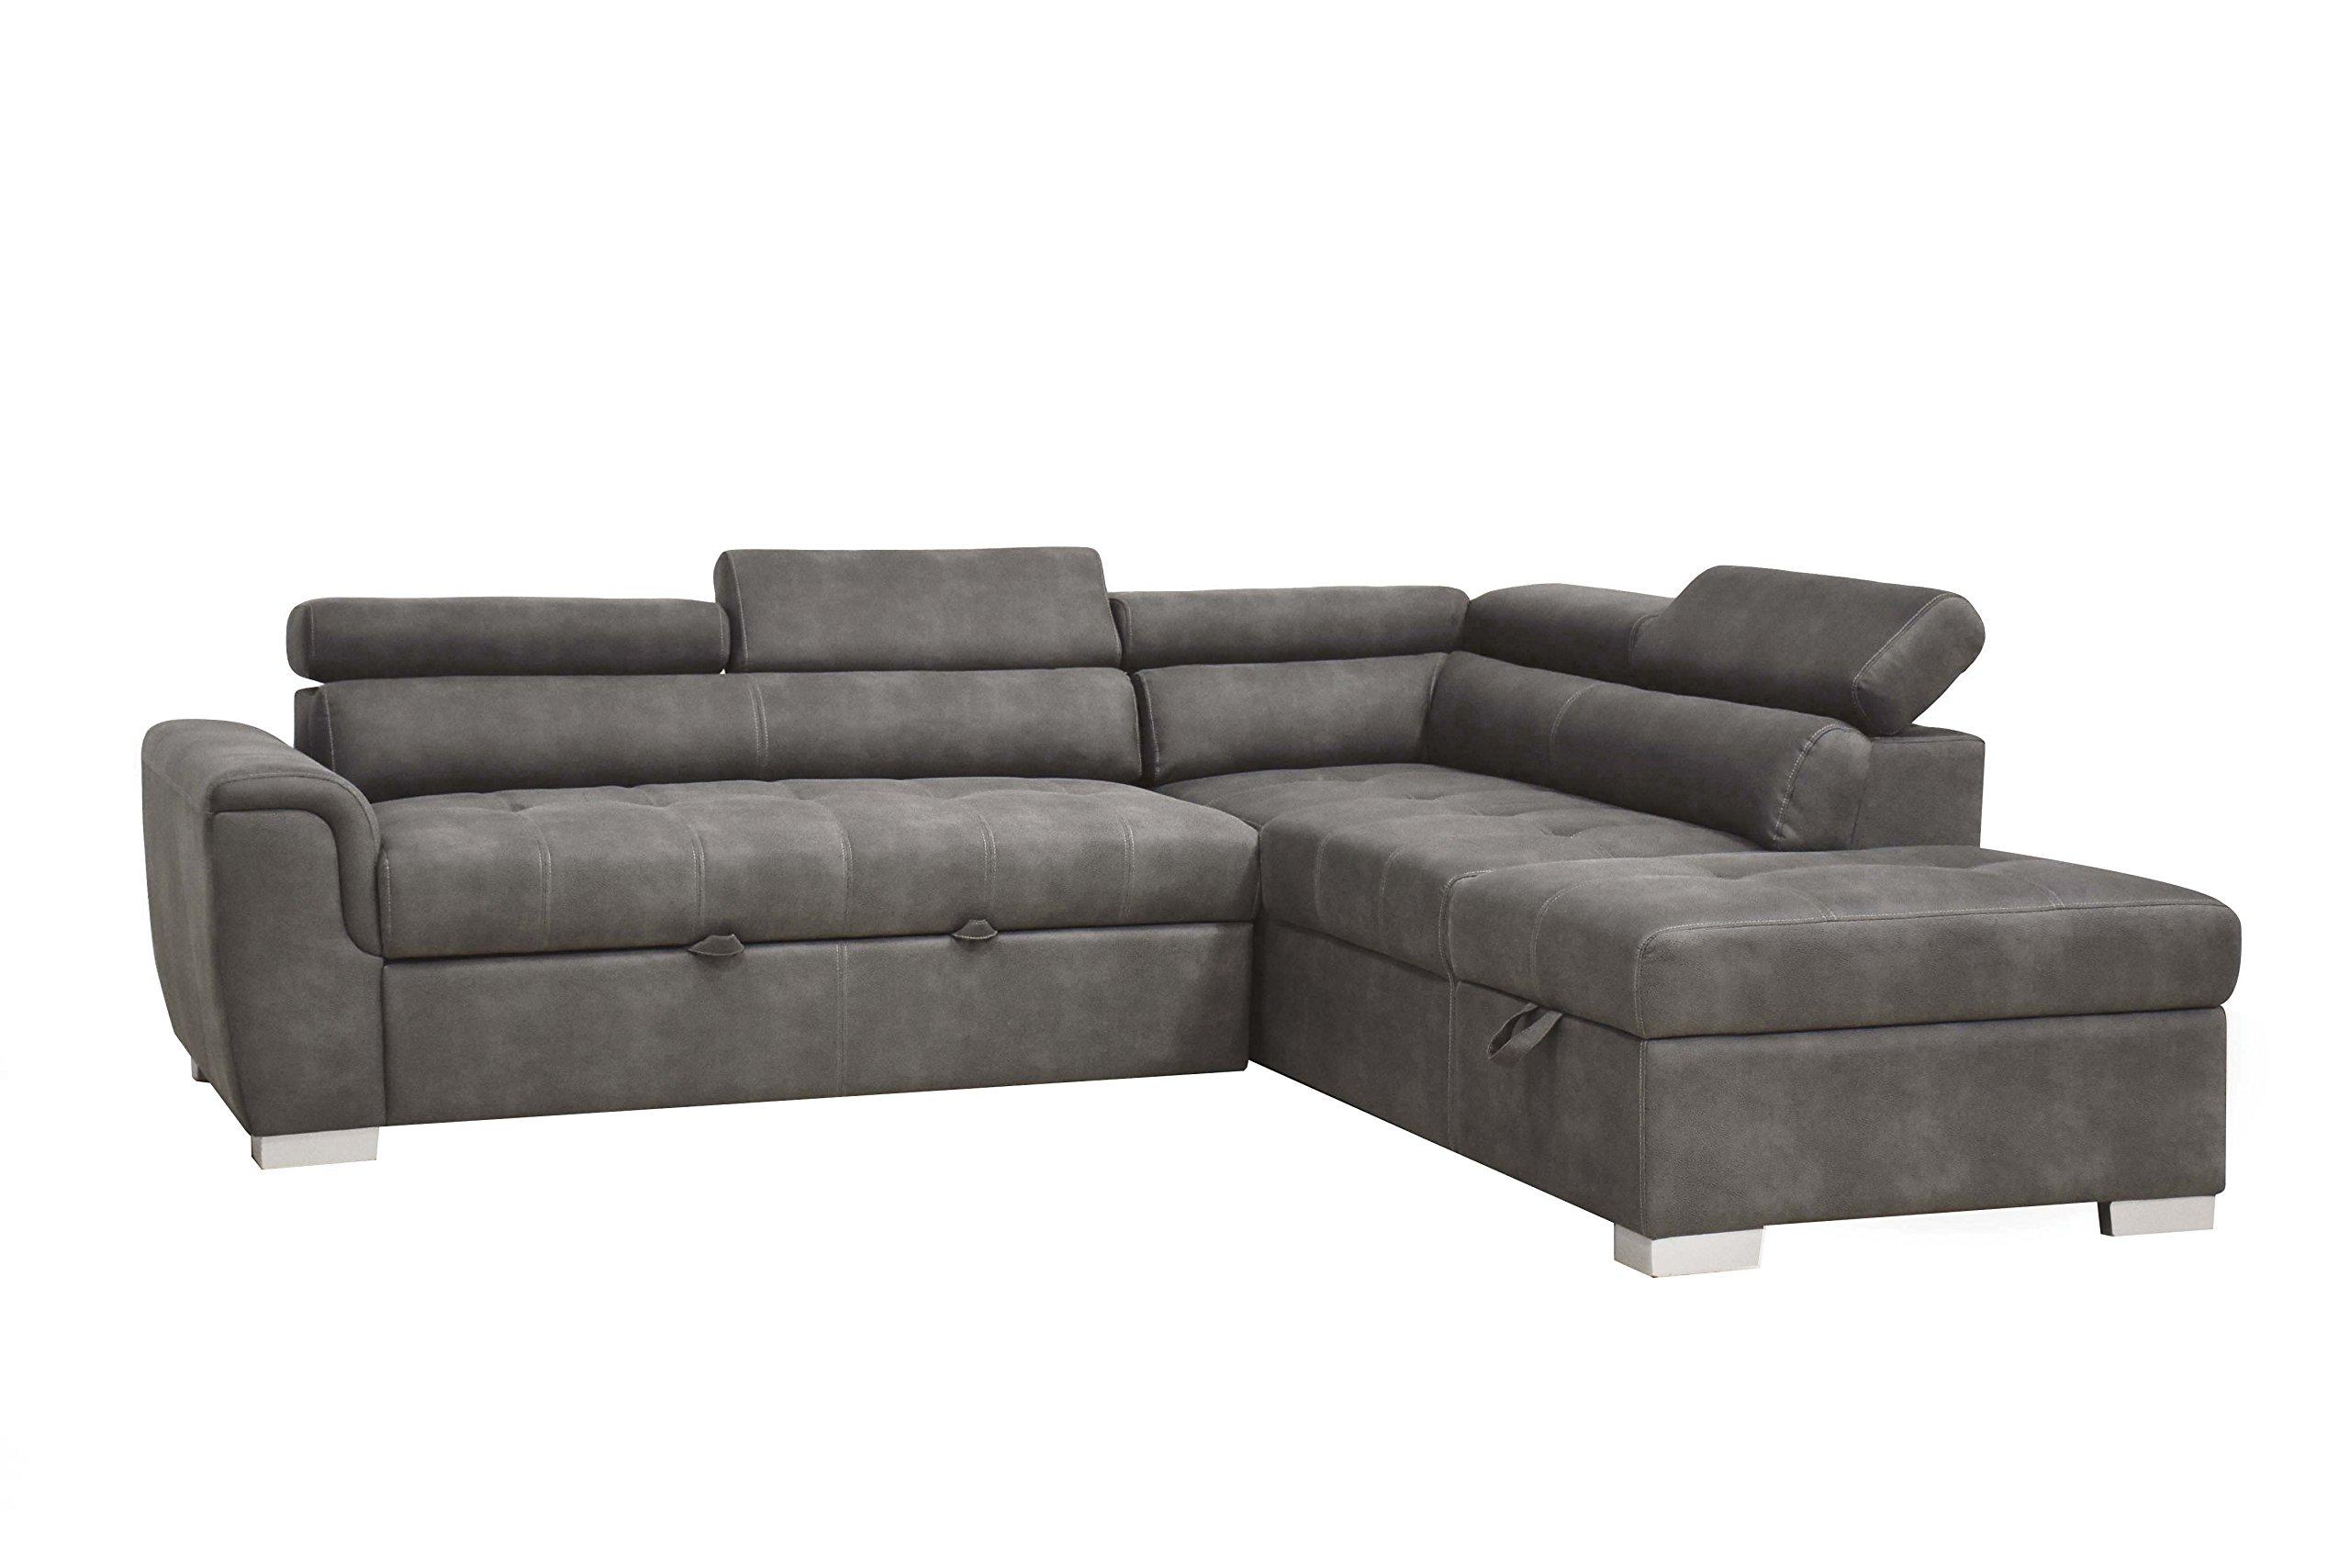 ACME Furniture Thelma Sleeper and Ottoman Sectional Sofa, Gray